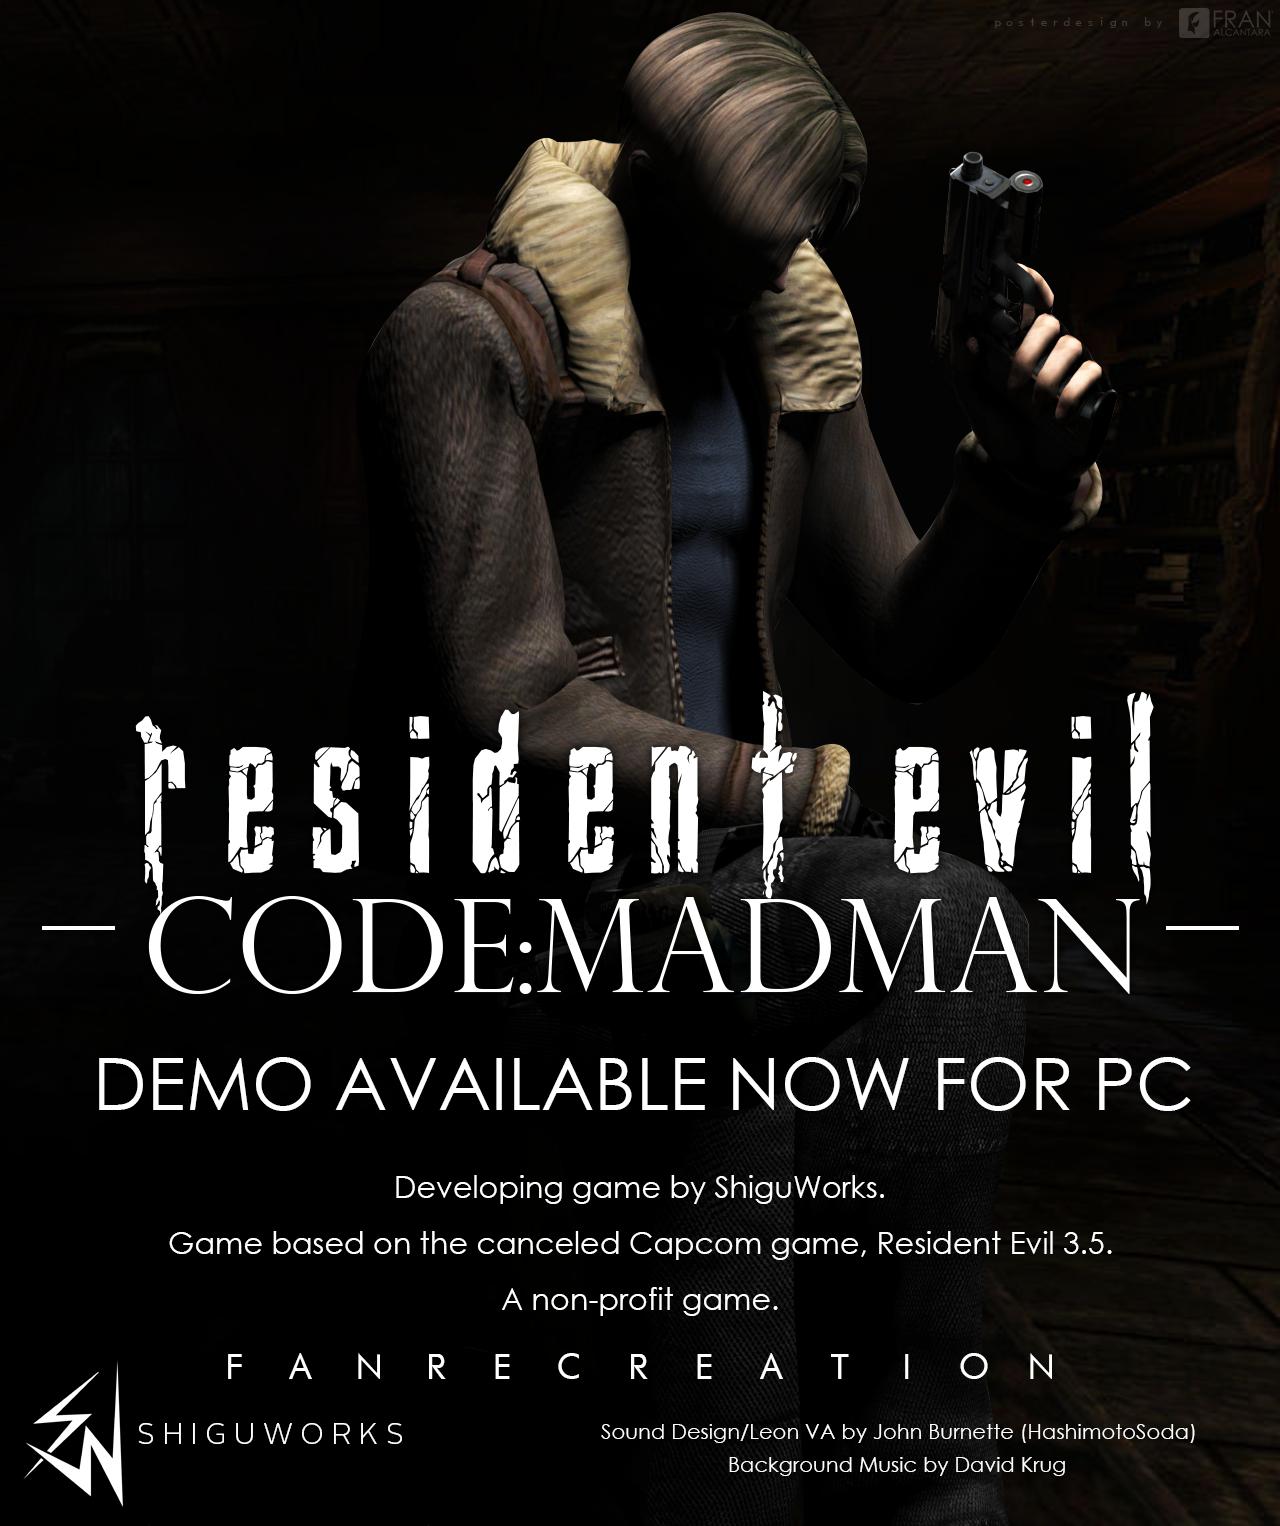 Resident Evil Code: Madman [Download Demo] by FrankAlcantara